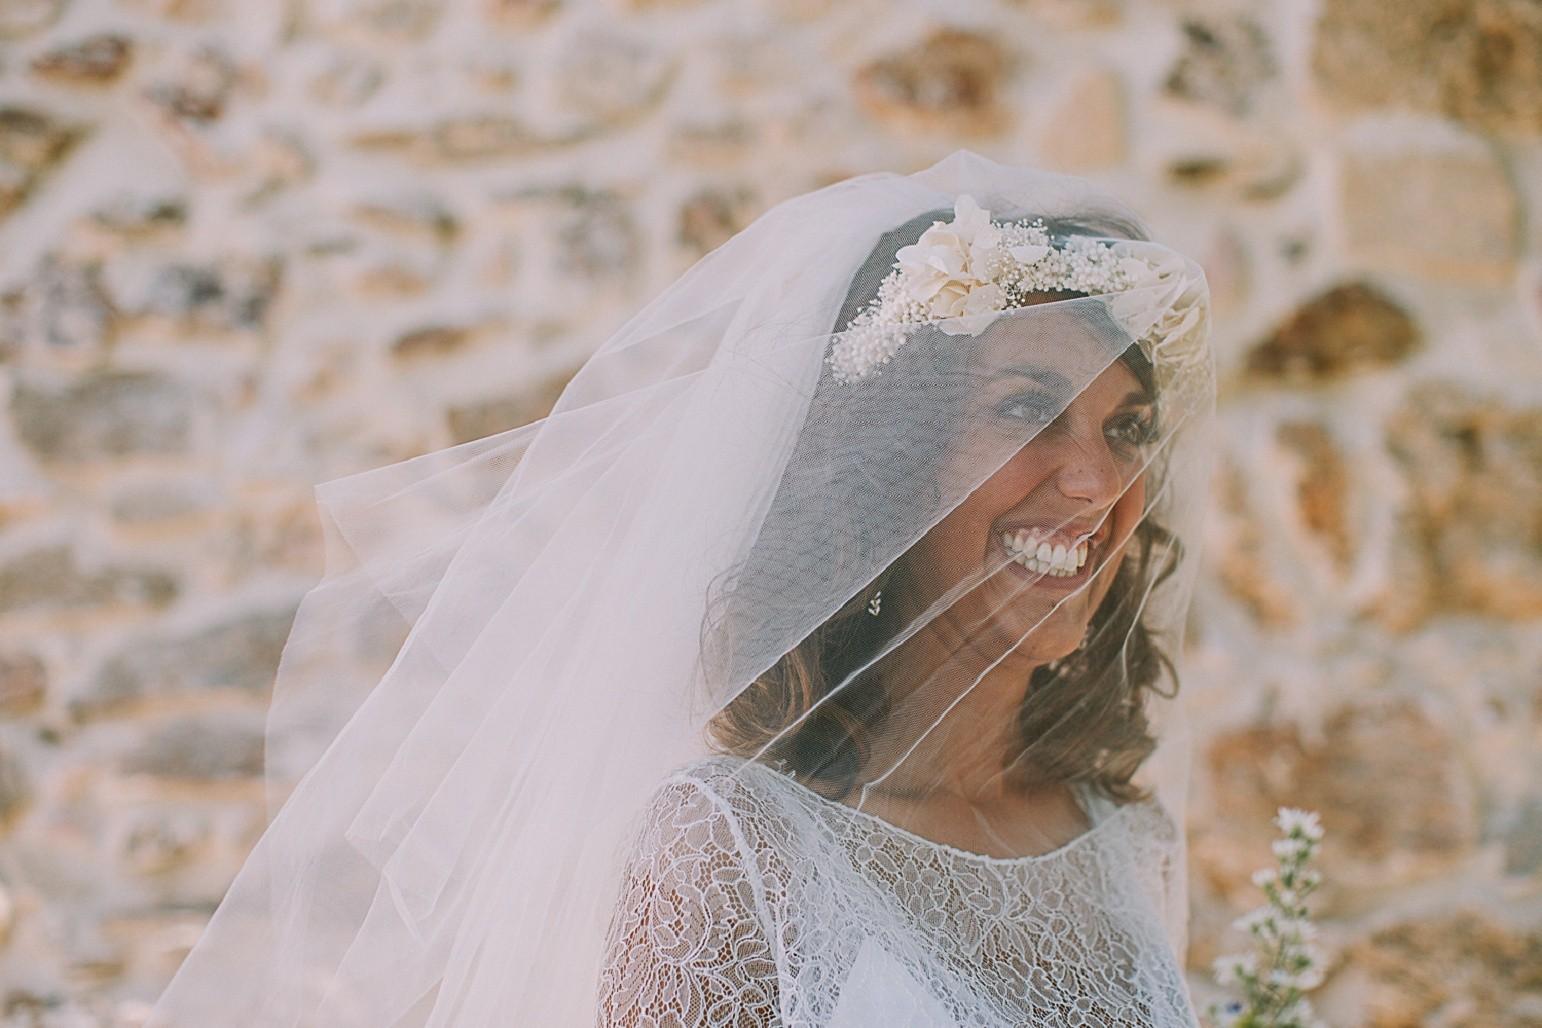 kateryna-photos-mariage-photographe-chateau-maime-aix-nice-provence-wedding-arcs-sur-argens-portrait-marie